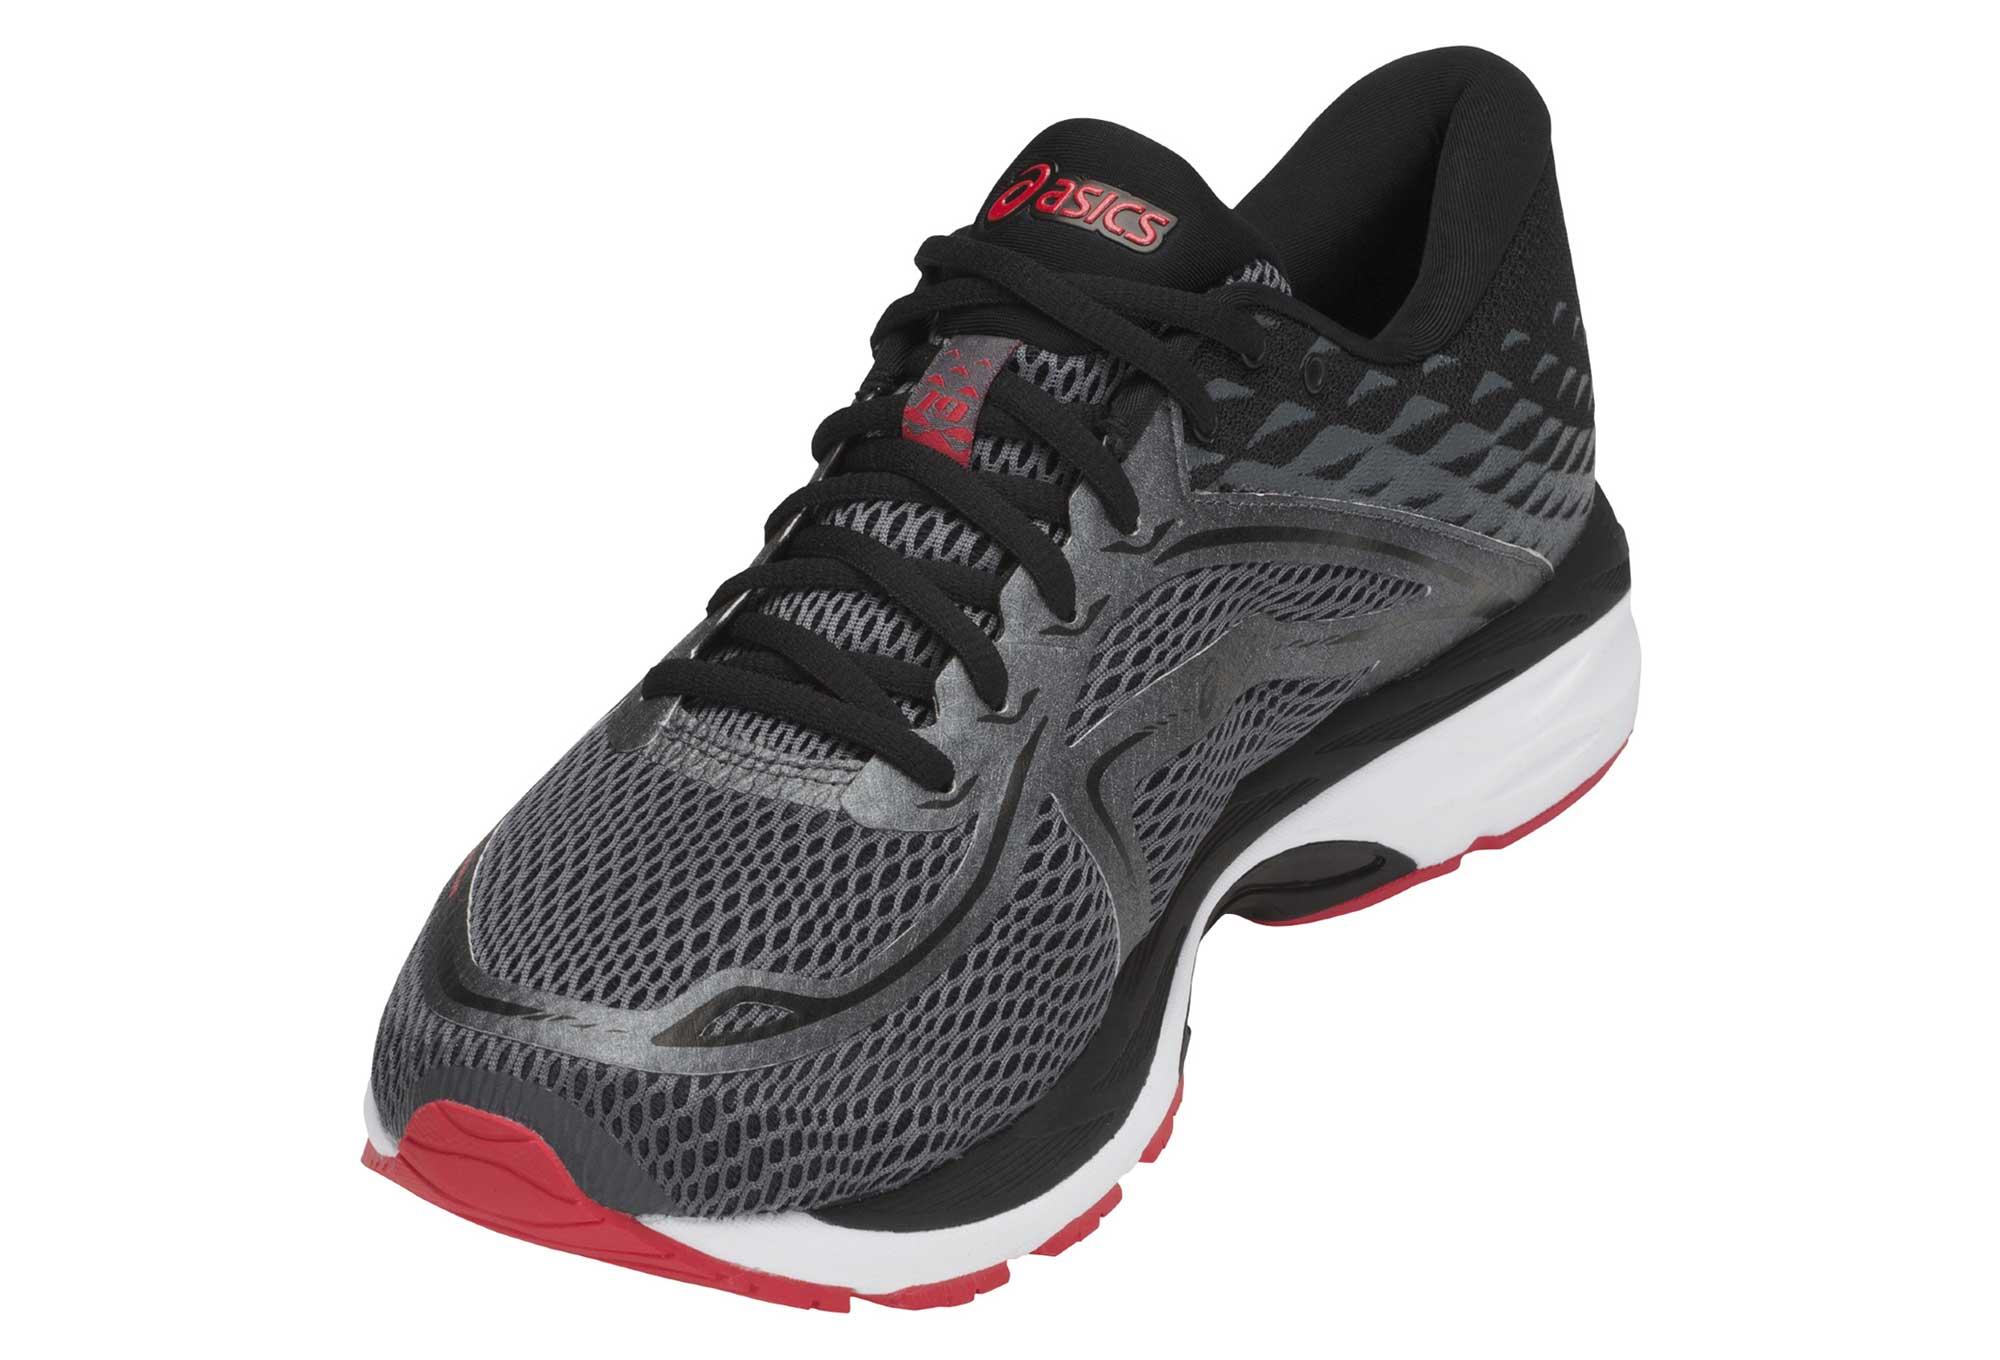 Chaussures de Running Asics Gel Cumulus 19 Gris Rouge